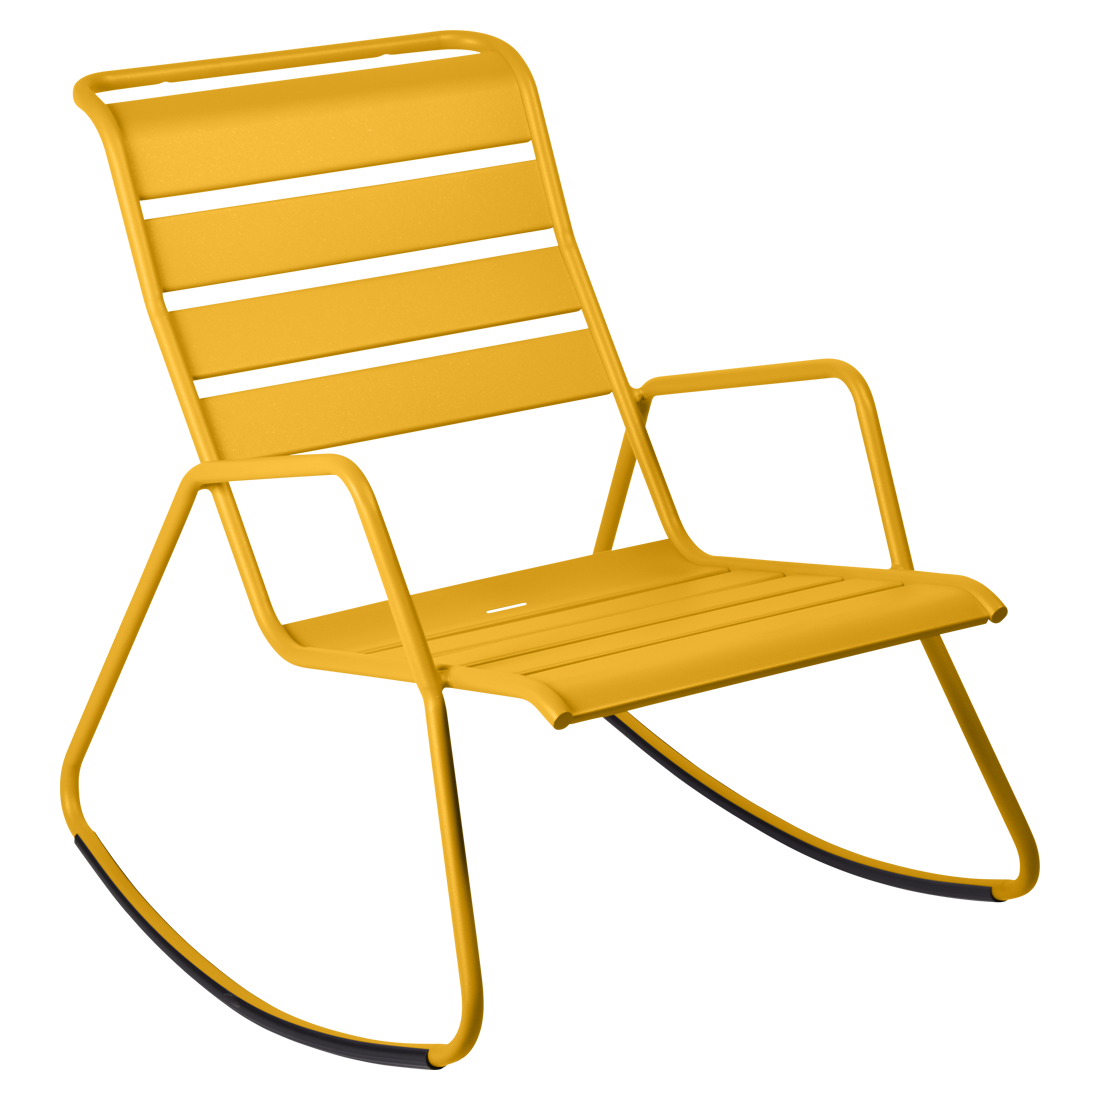 rocking chair metal, rocking chair fermob, rocking chair jardin, rocking chair jaune